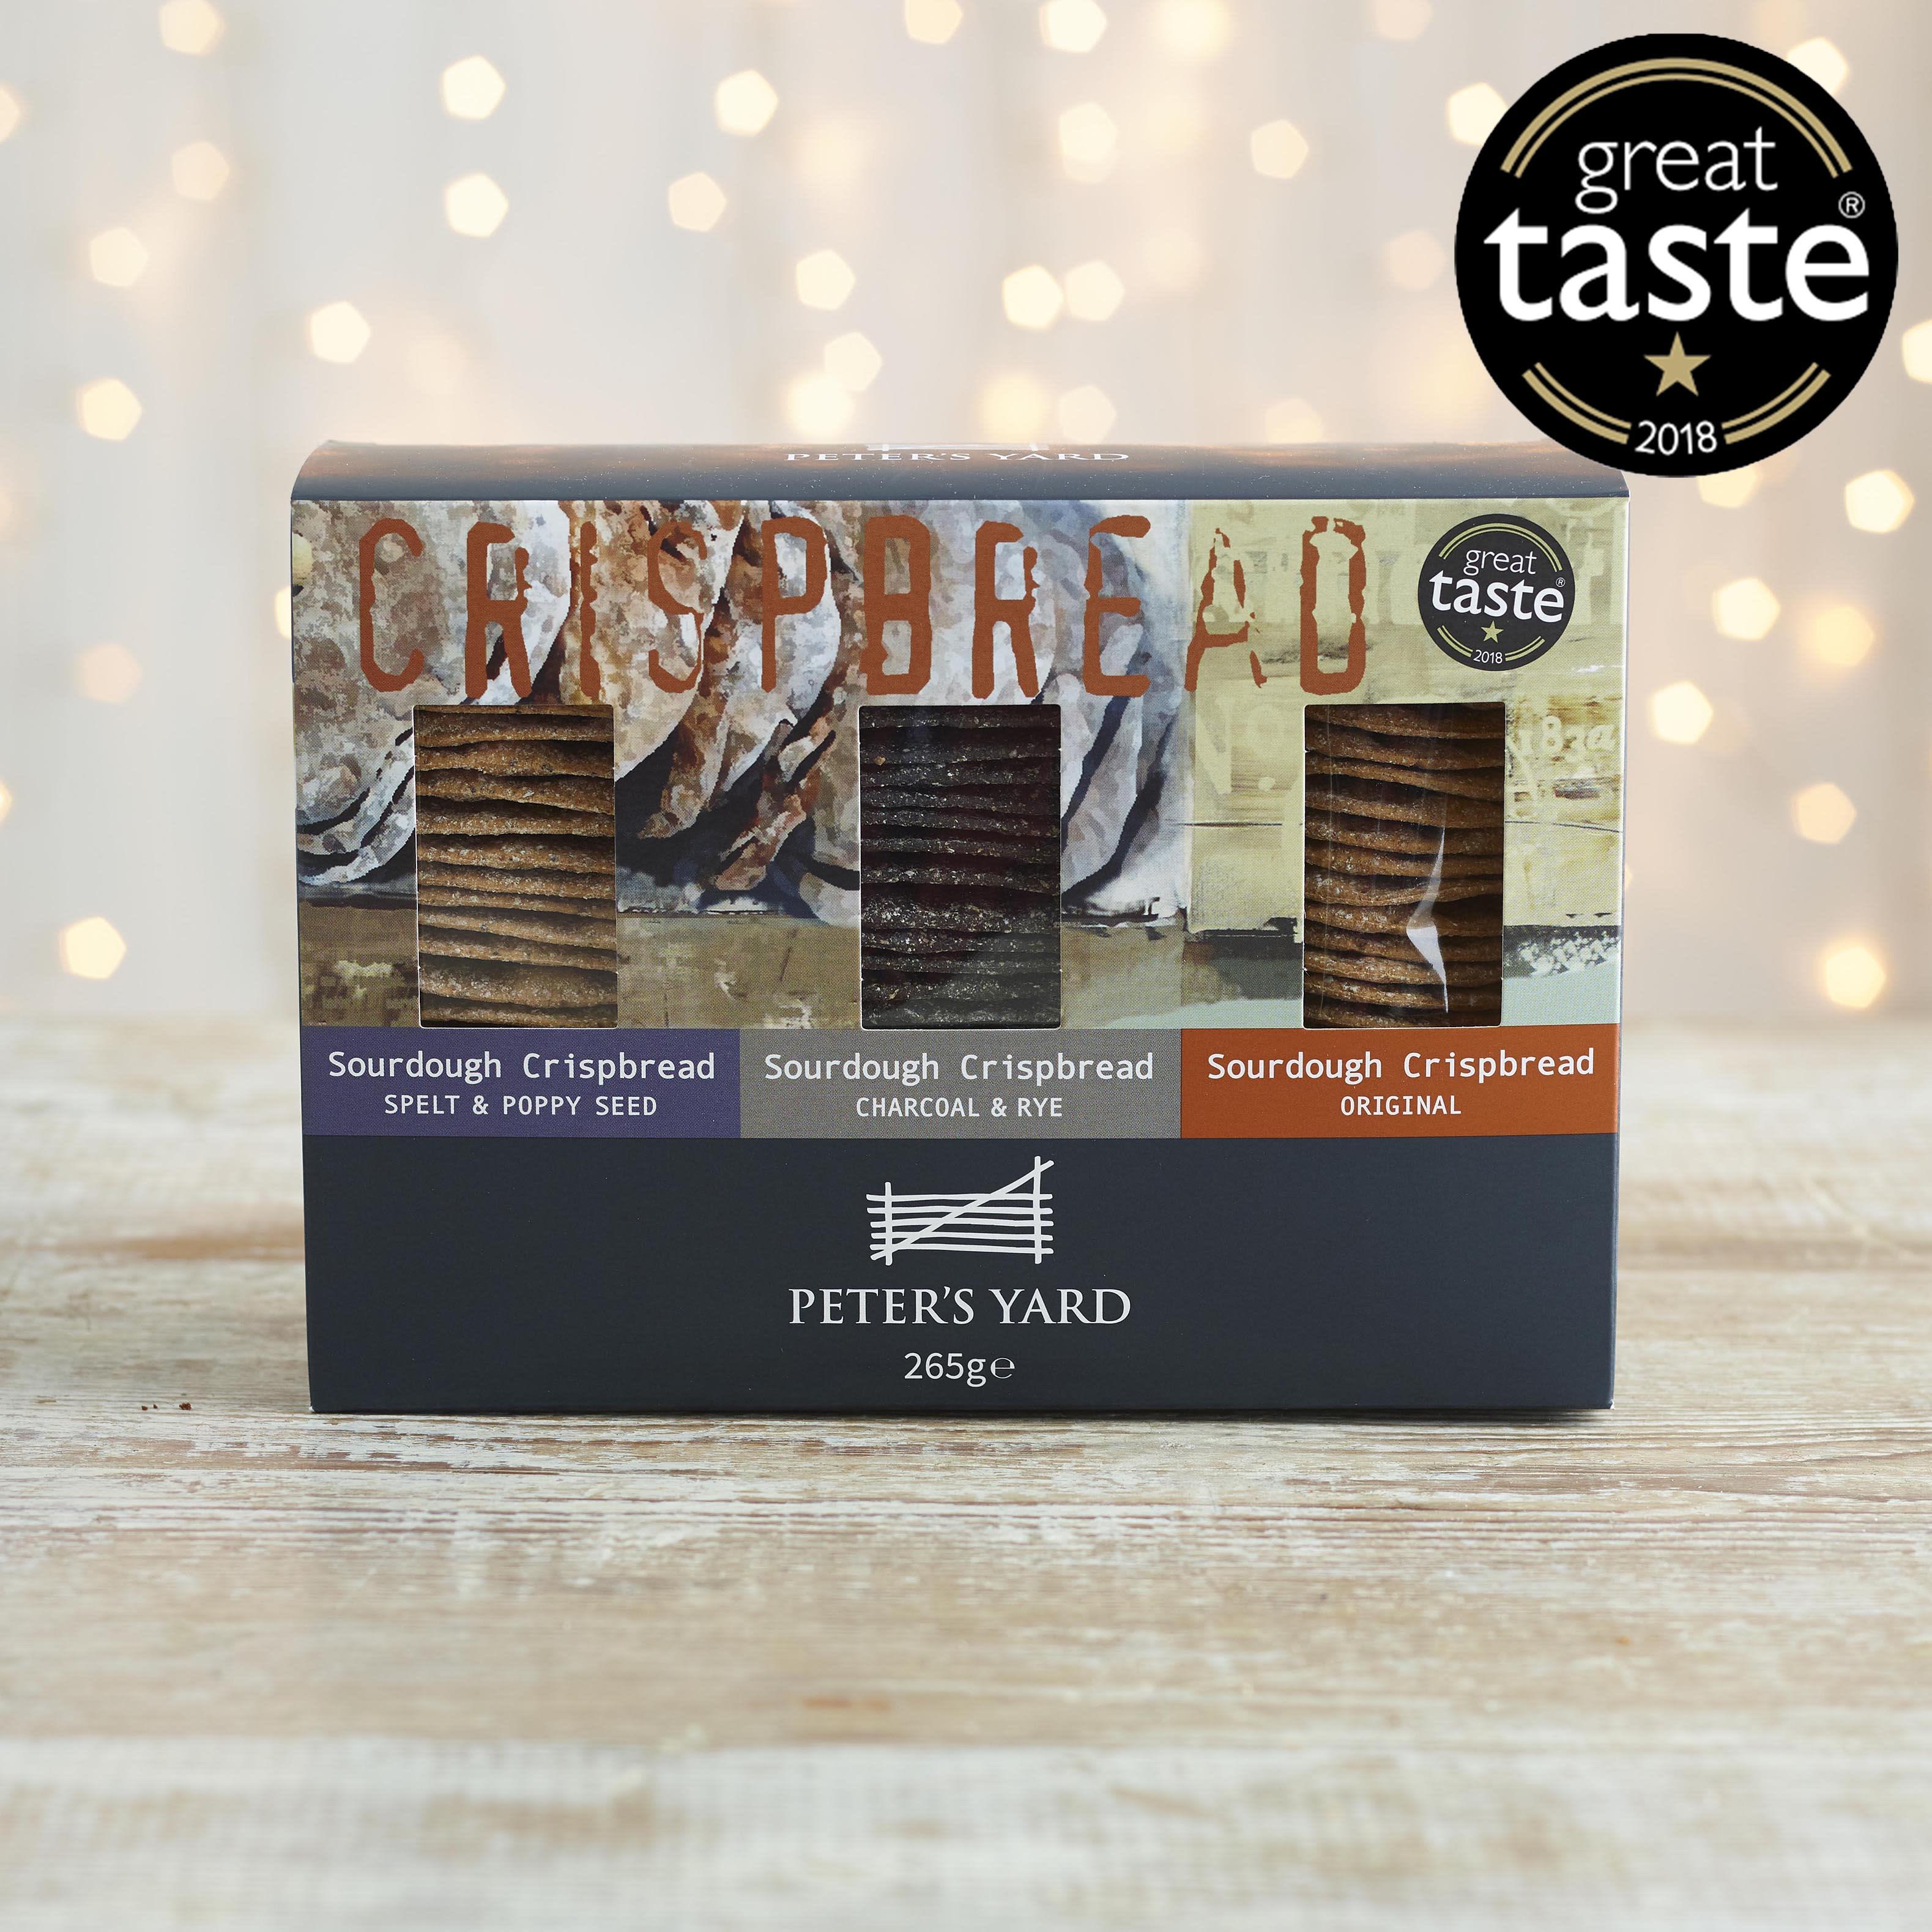 Peter's Yard  Sourdough Crispbread Selection Box, 265g